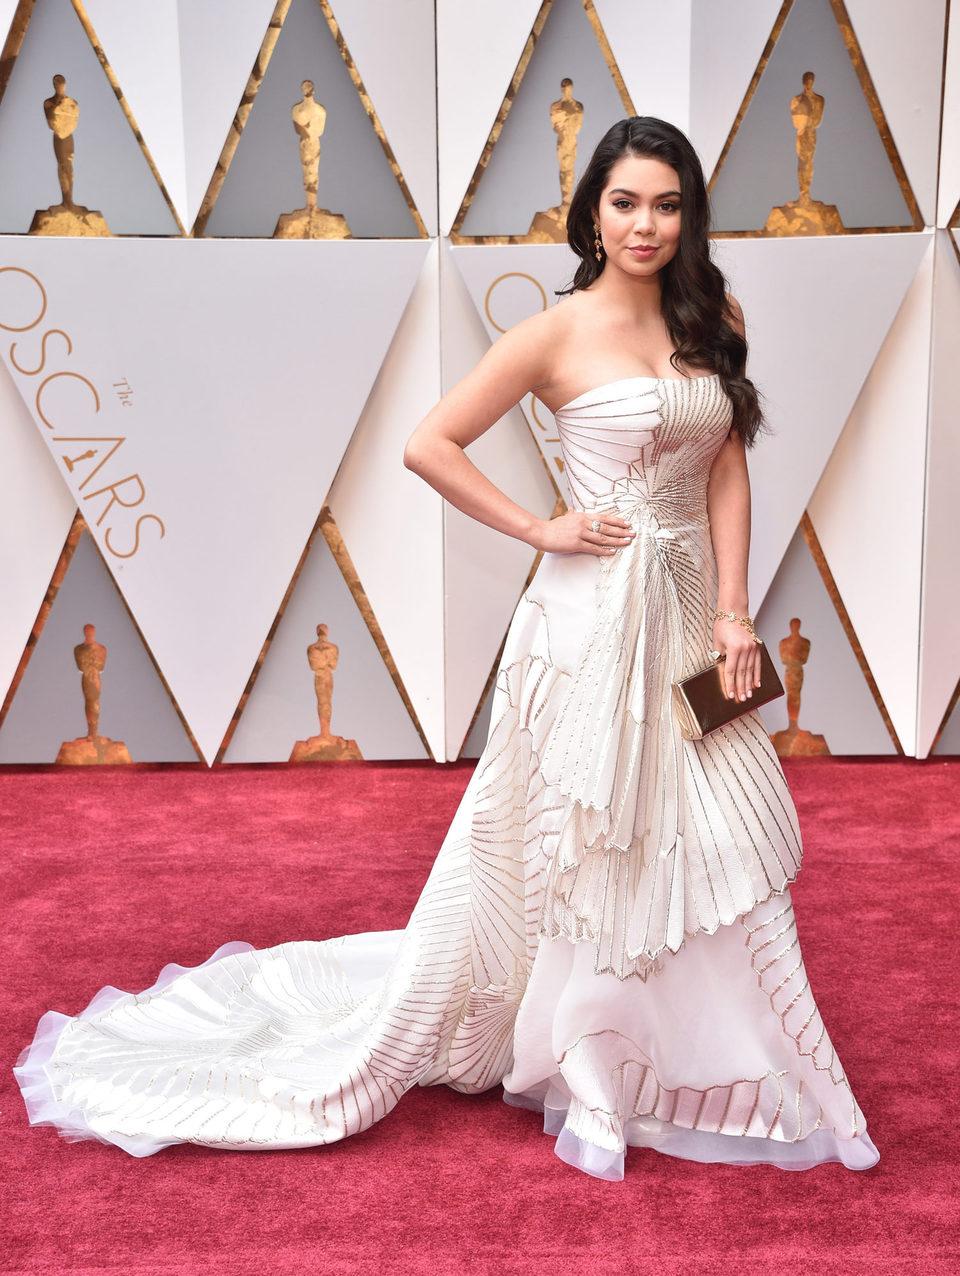 Auli'i Cravalho at the Oscars 2017 red carpet